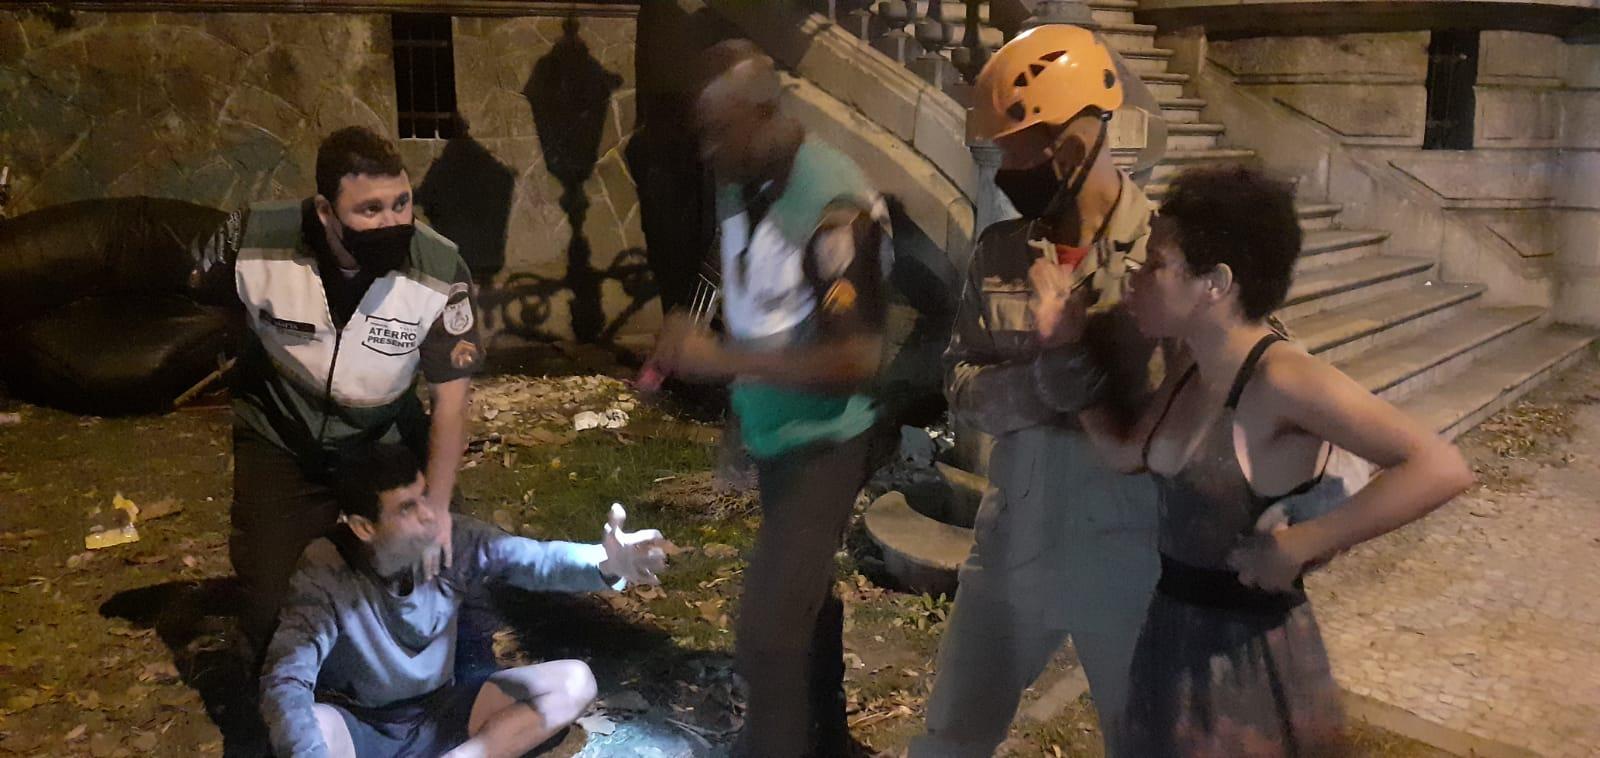 Polícia liberta jovens vítimas de sequestro na Zona Sul do Rio